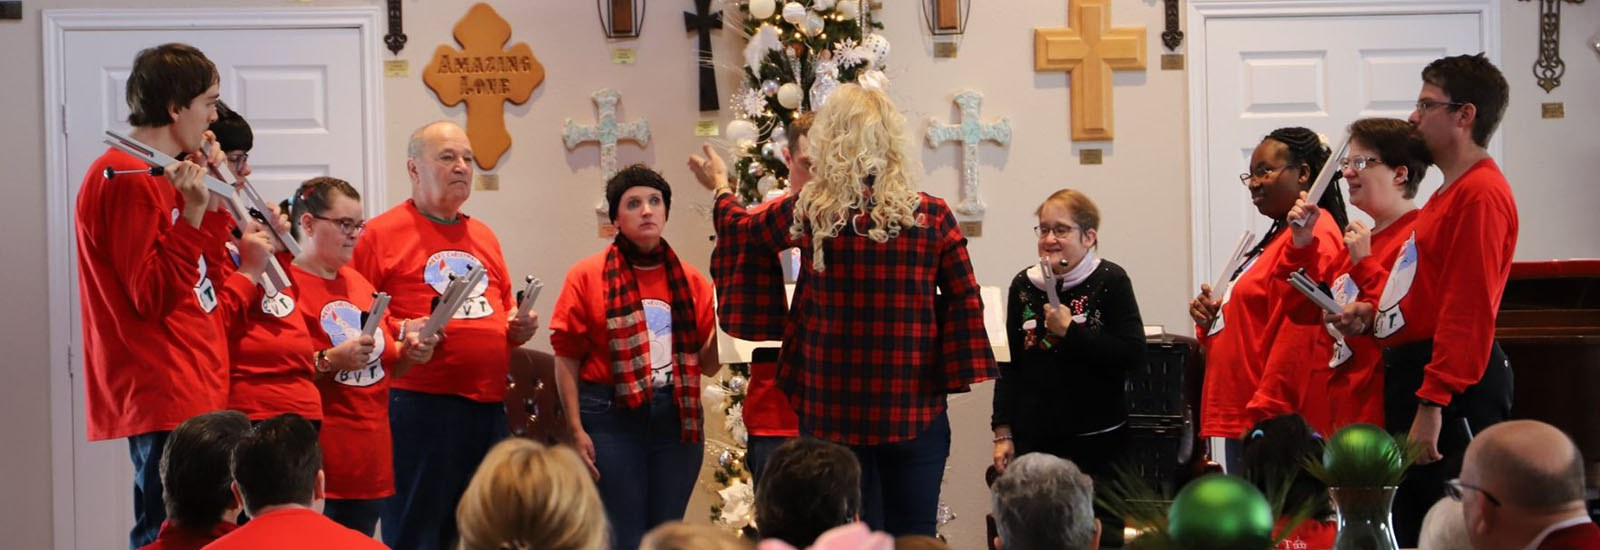 Photo: Services at Breckenridge Village of Tyler